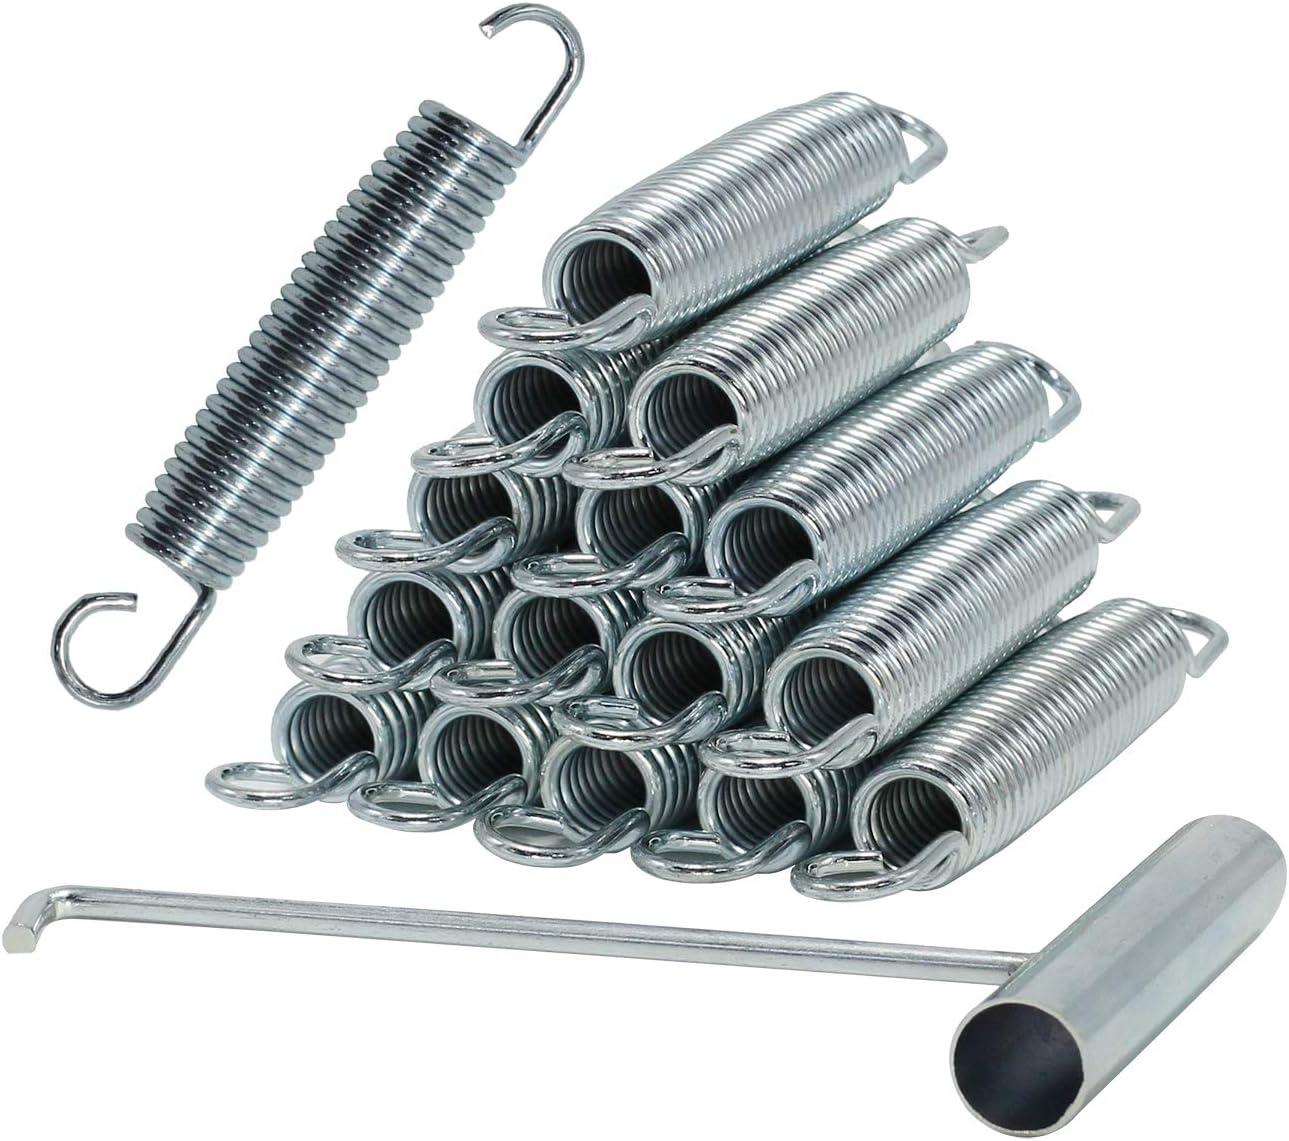 5.5 Inch Trampoline Springs Heavy Duty Stainless Steel ReplacementSprings, Set of 16